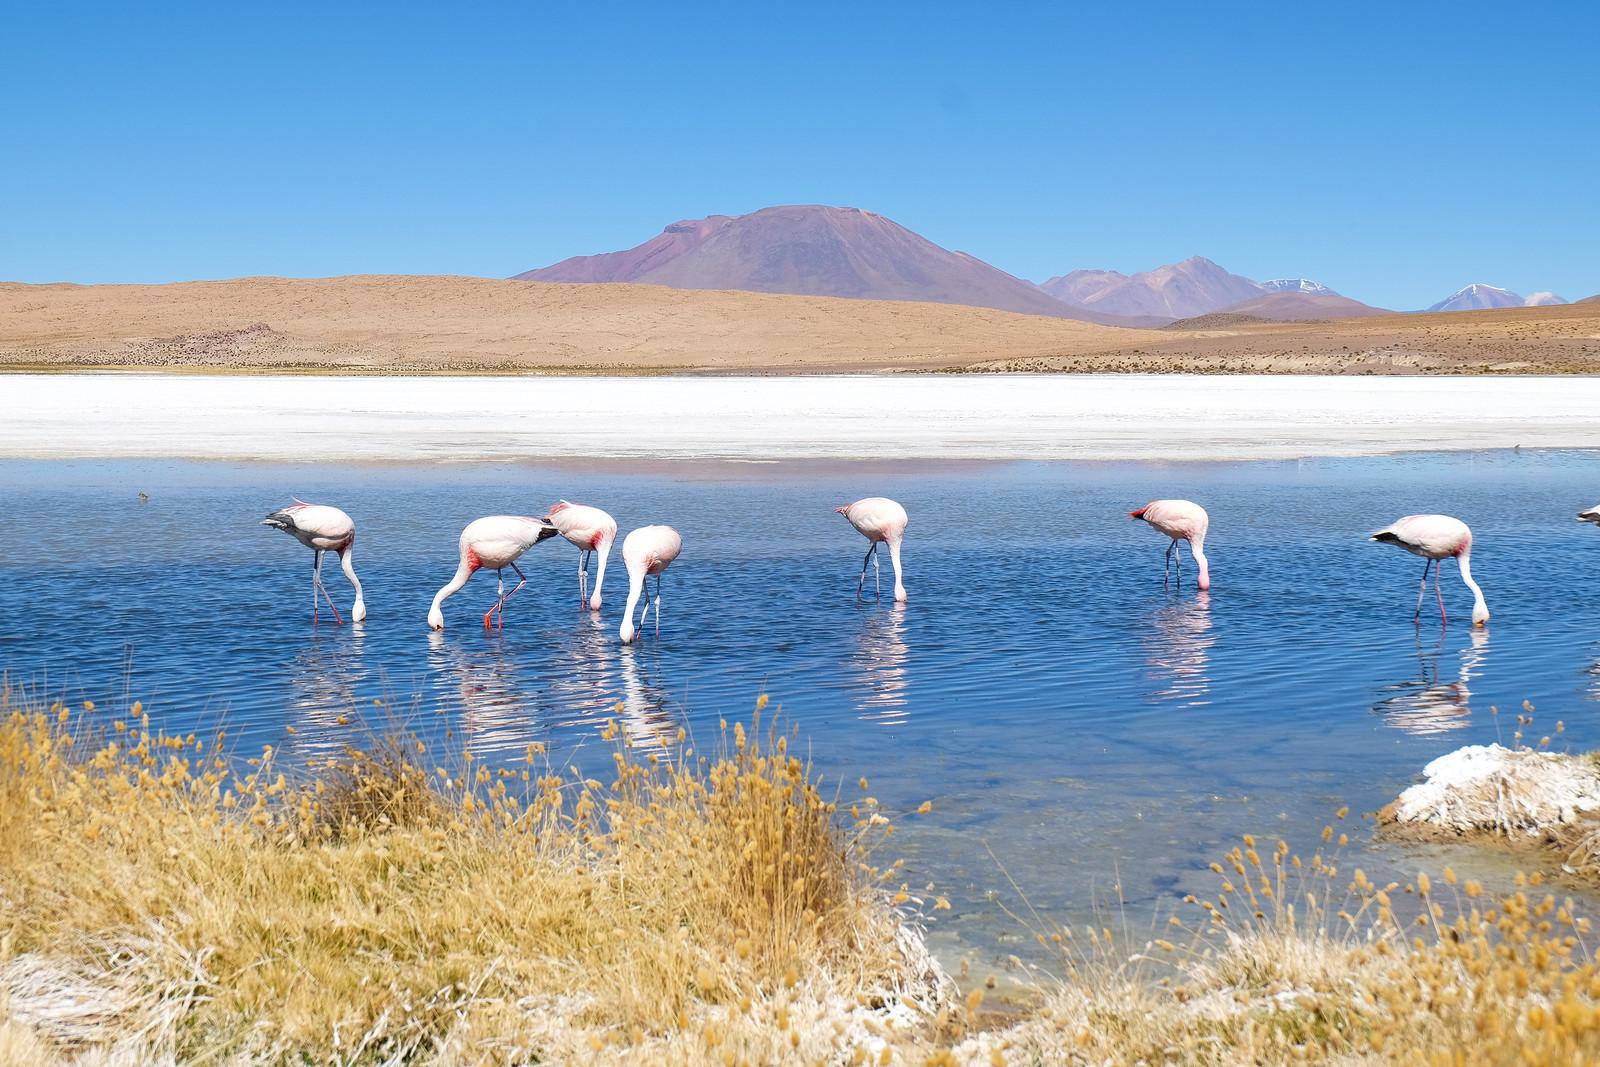 Laguna, Bolivian Altiplano